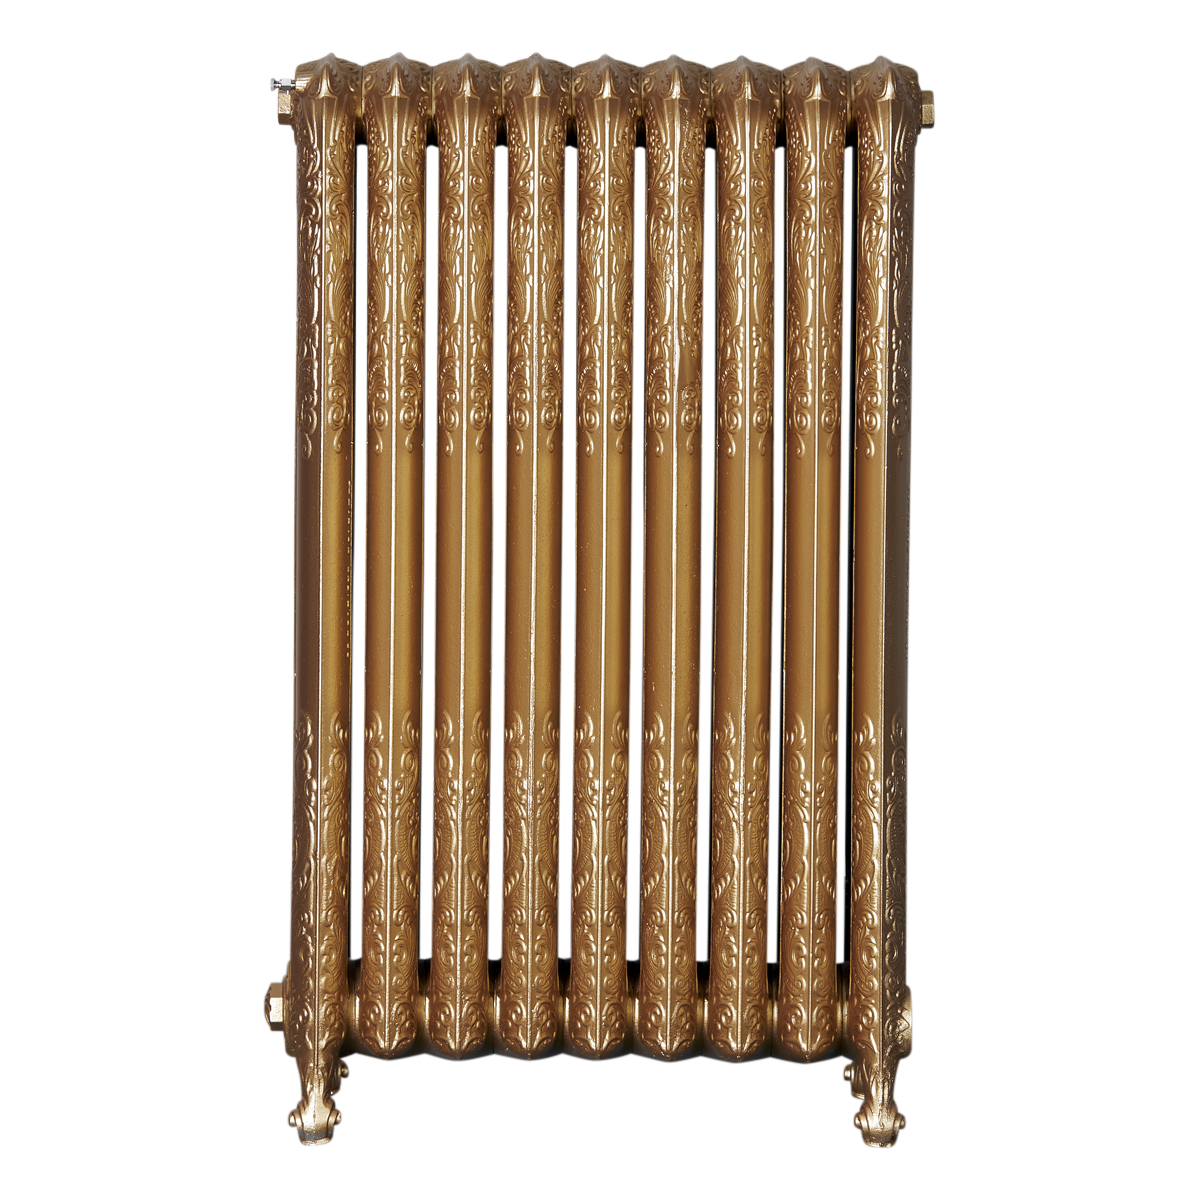 Ironworks Radiators Inc. refurbished cast iron radiator Freemont in Pale Gold metallic